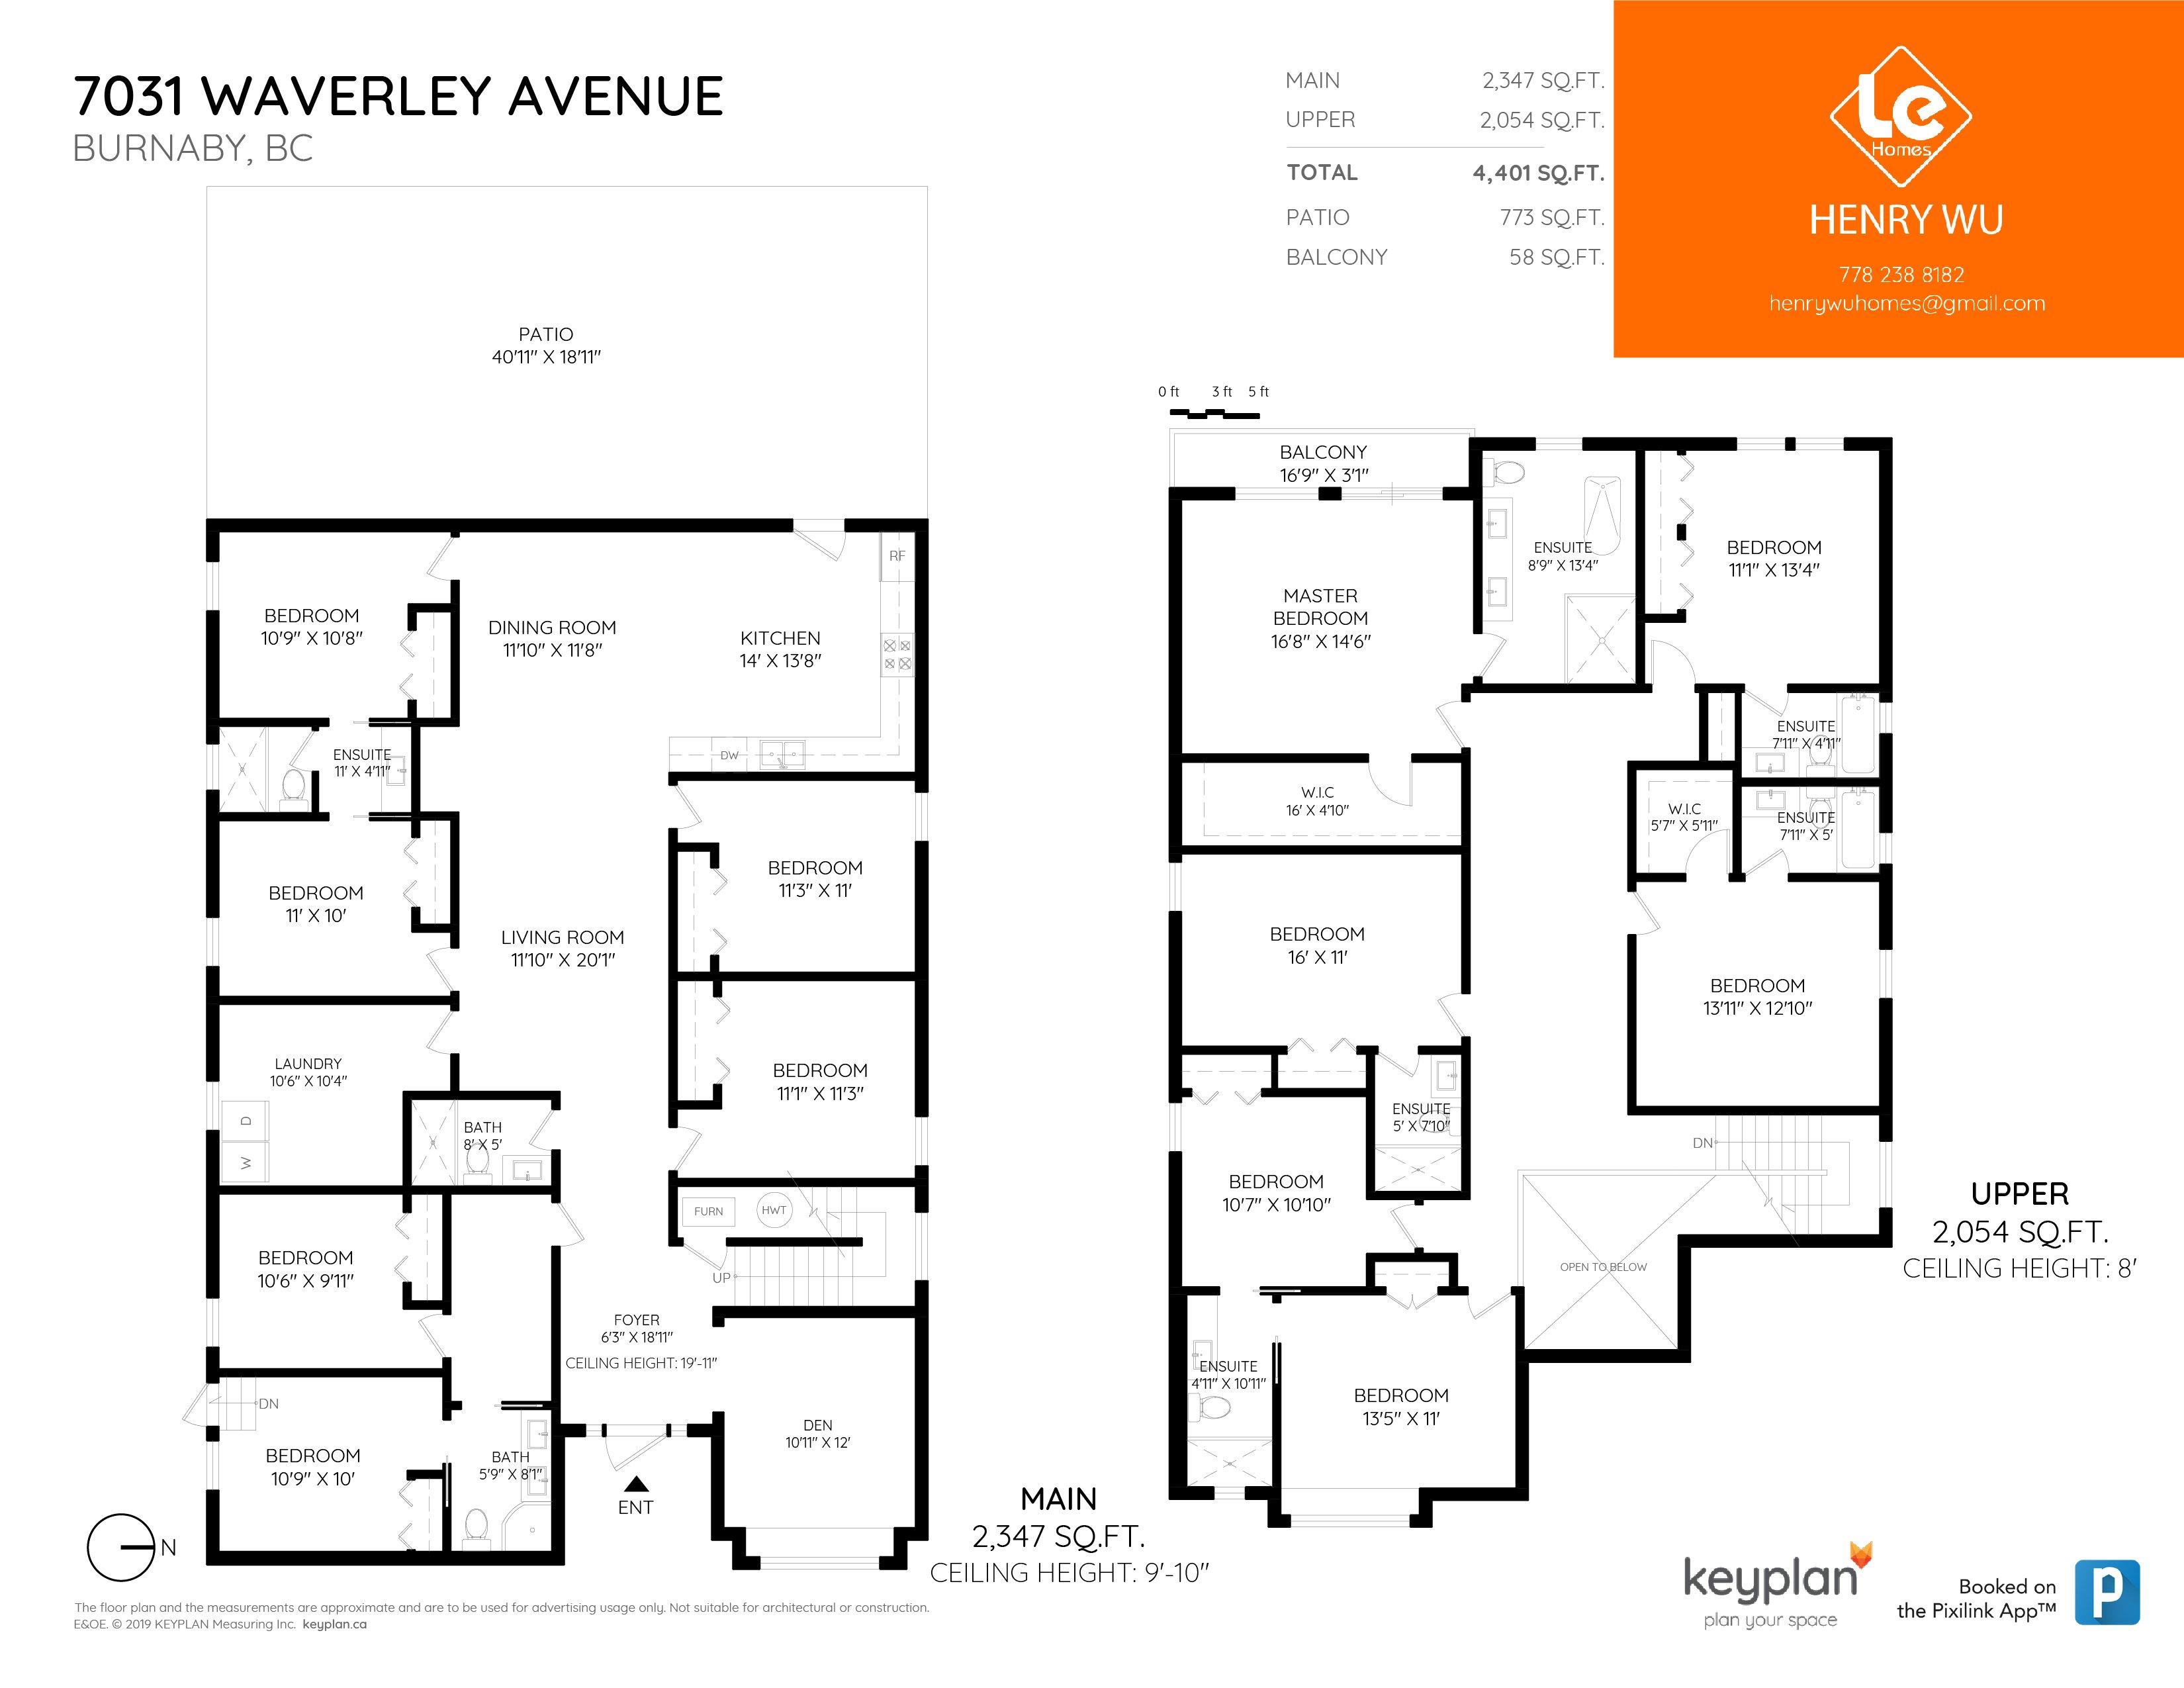 Astonishing 7031 Waverley Avenue Burnaby Bc V5J 4A4 Download Free Architecture Designs Scobabritishbridgeorg